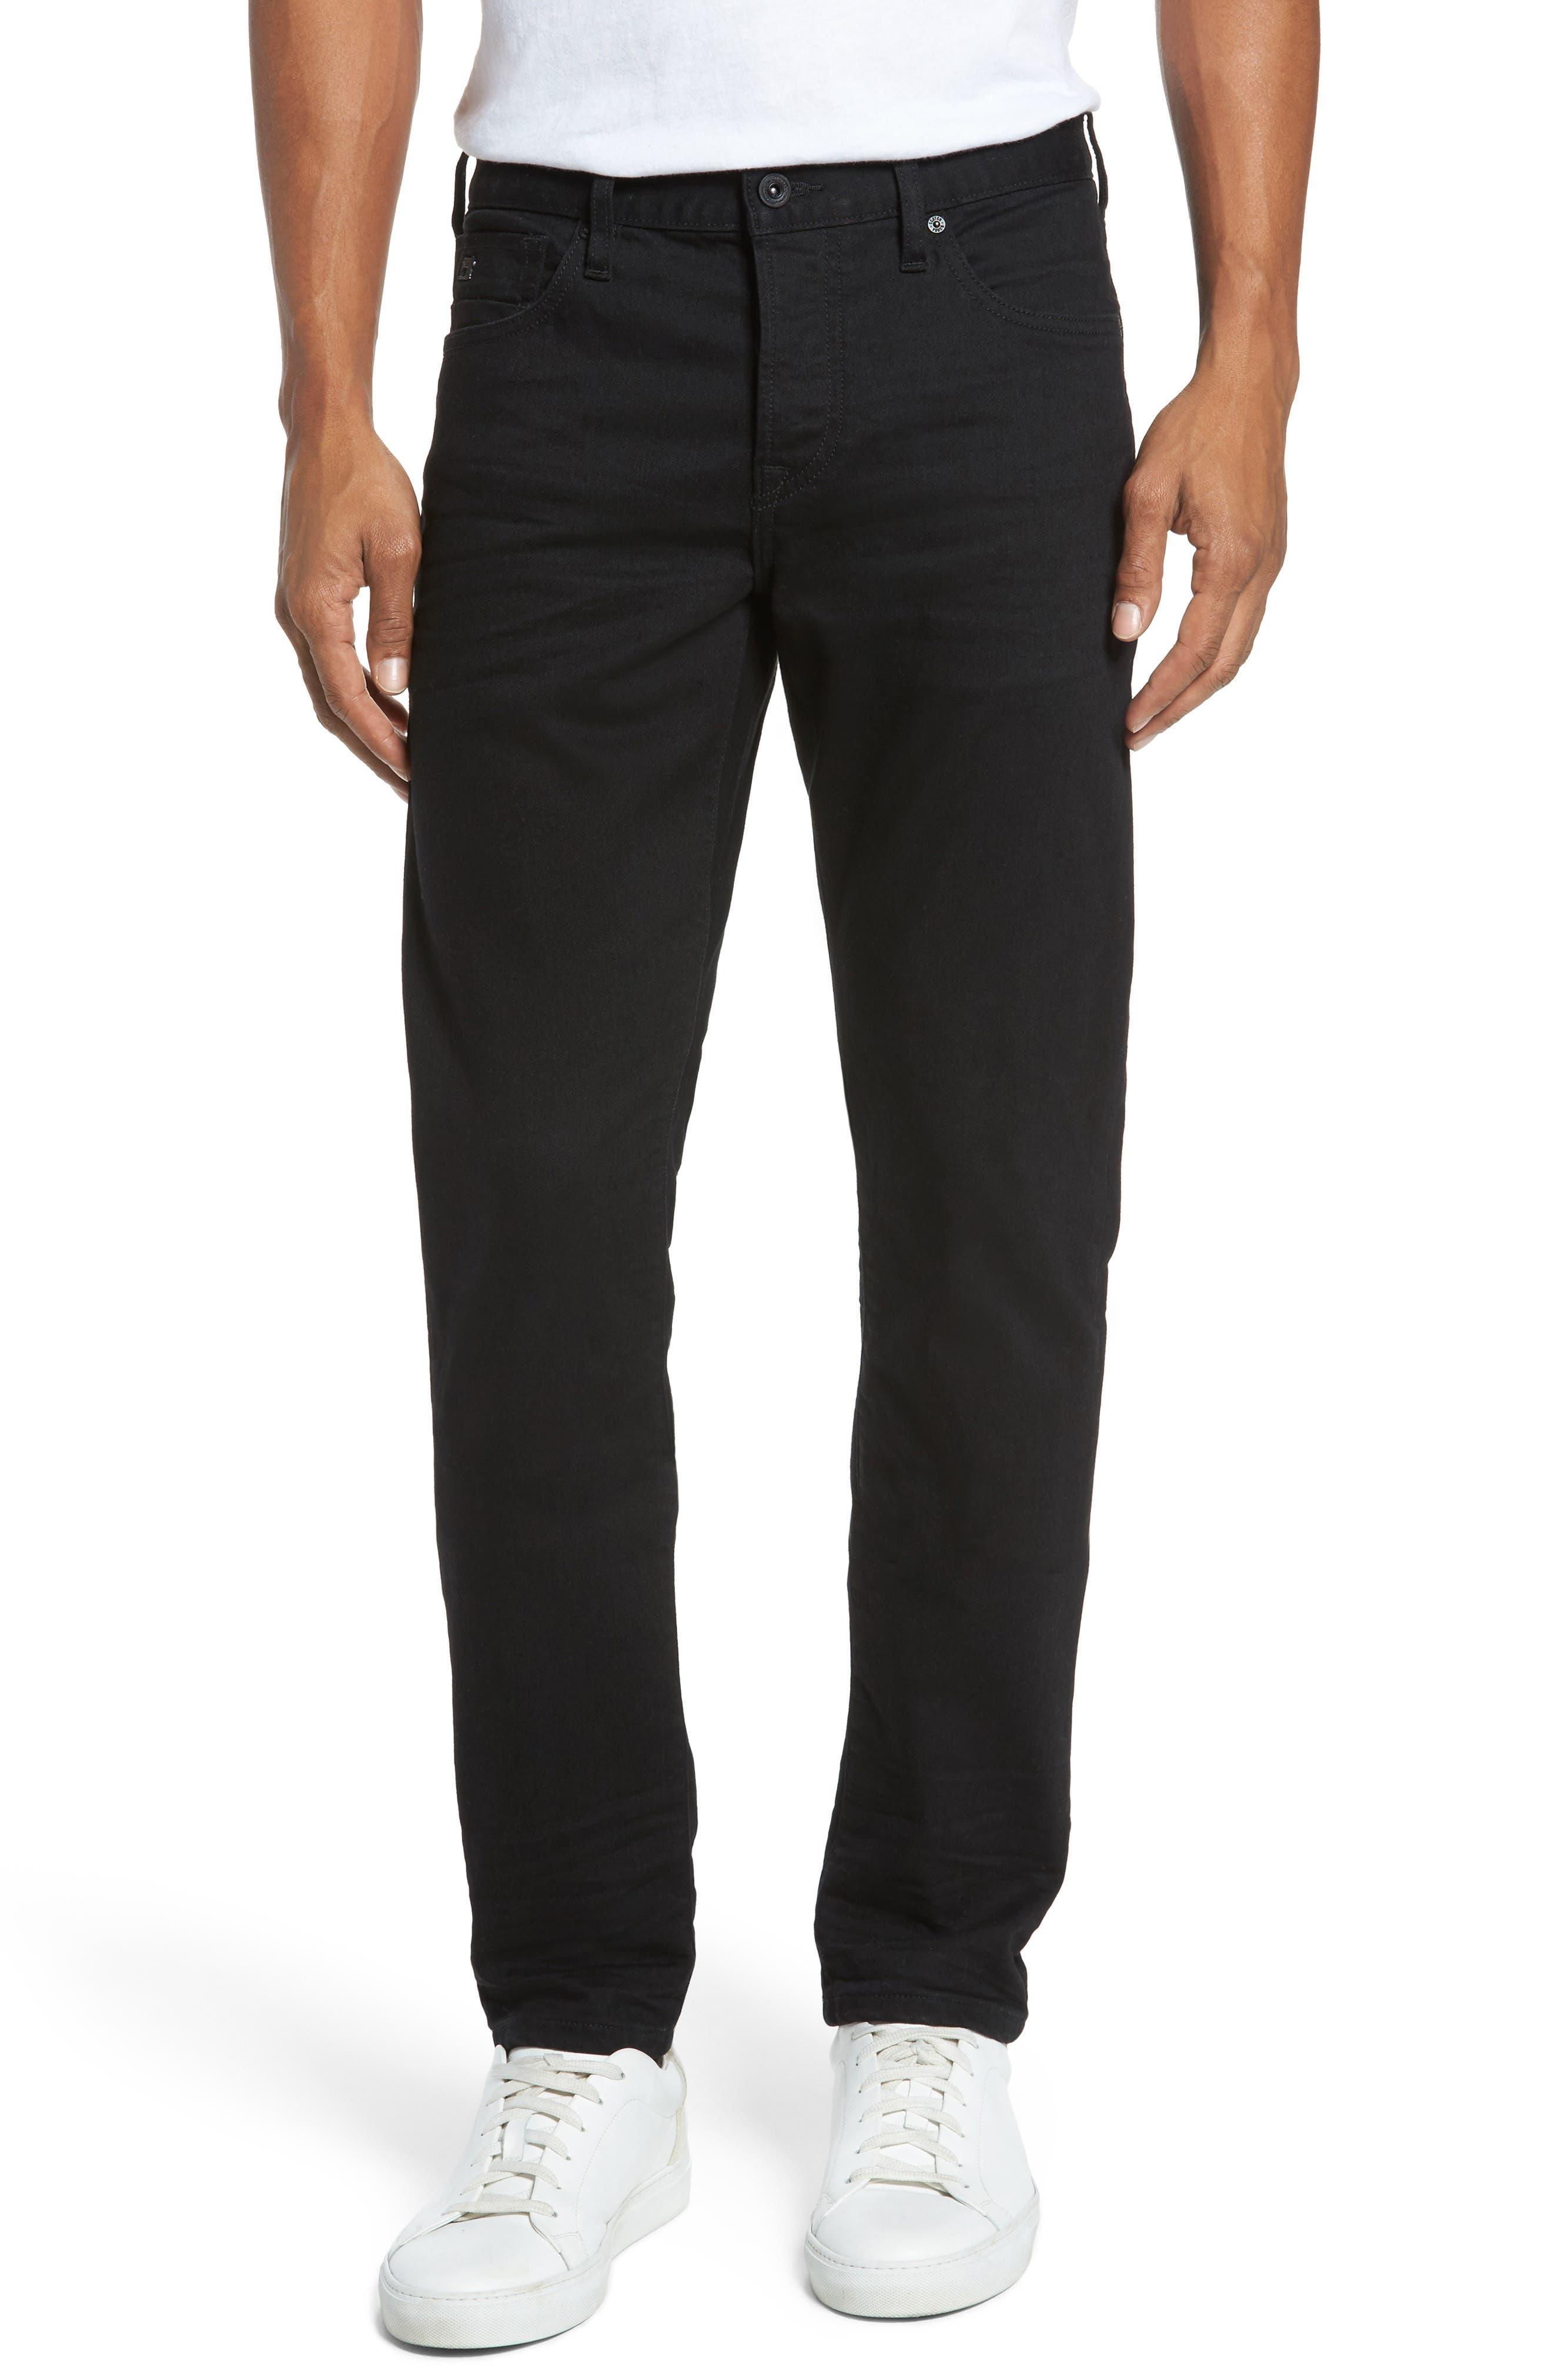 Scotch & Soda Ralston Slim Straight Leg Jeans (Stay Black)